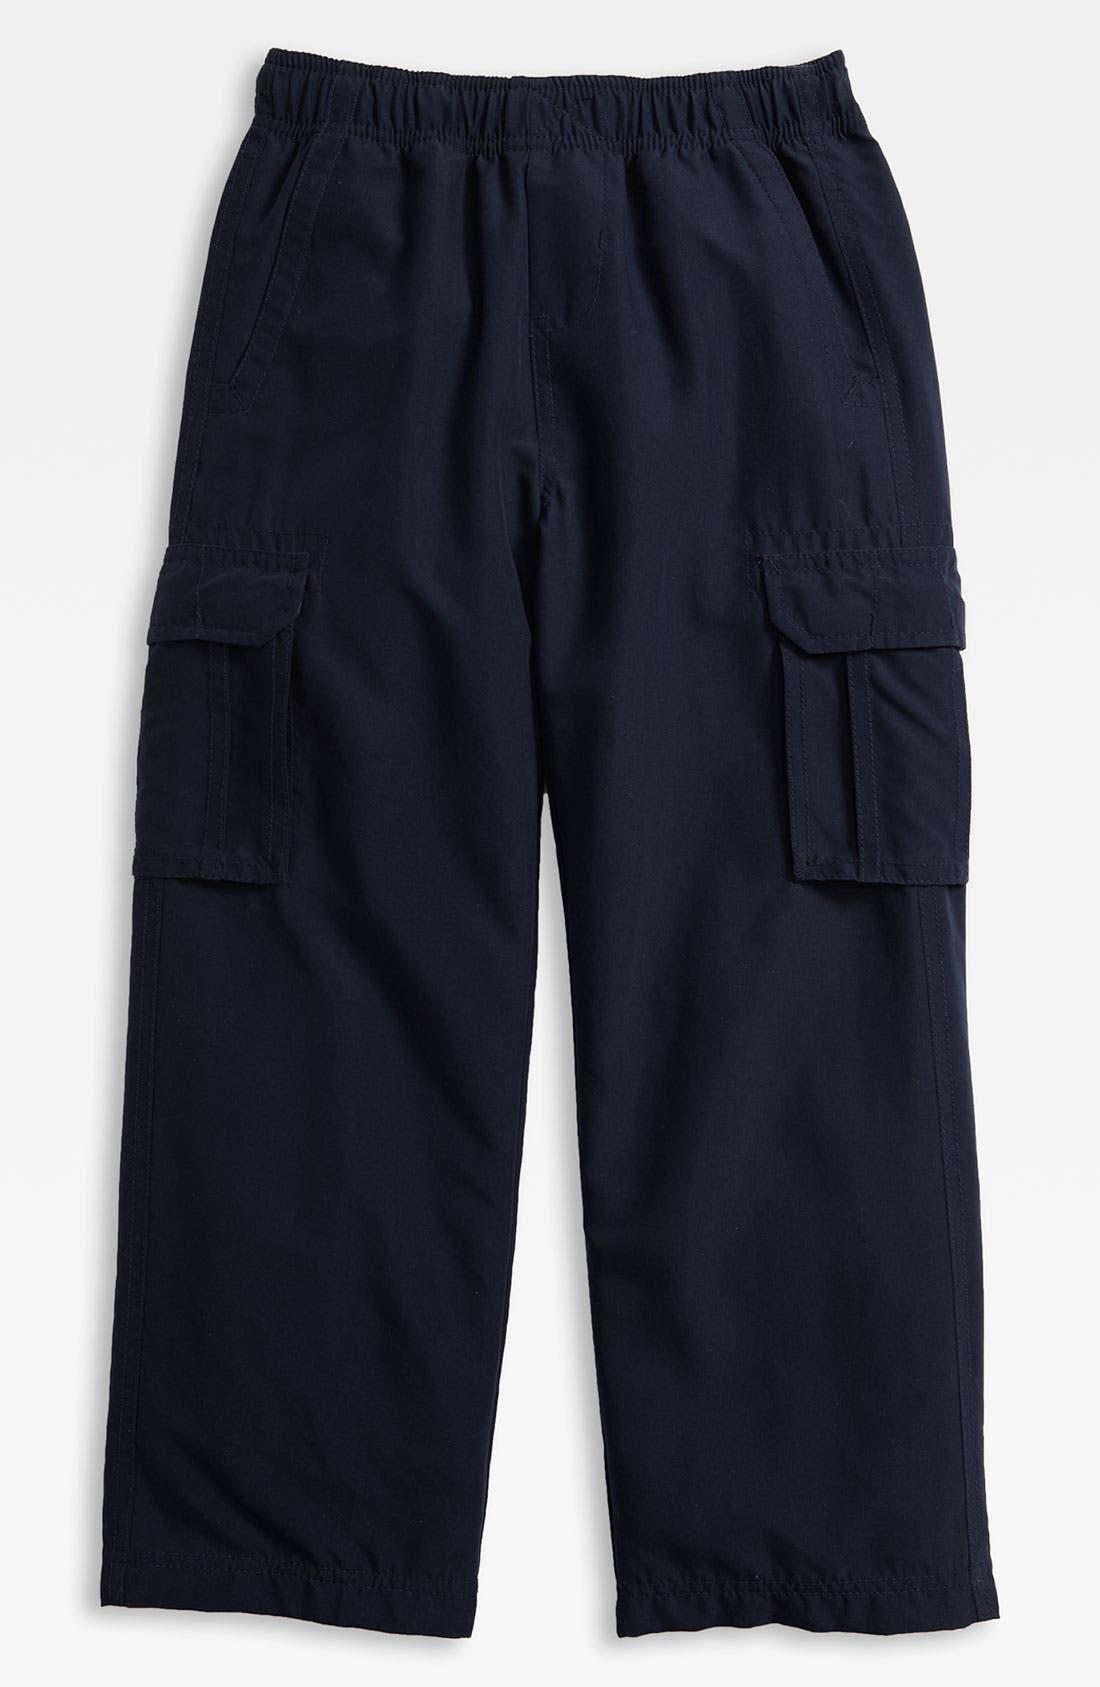 Alternate Image 1 Selected - Pure Stuff 'Summit' Cargo Pants (Little Boys)